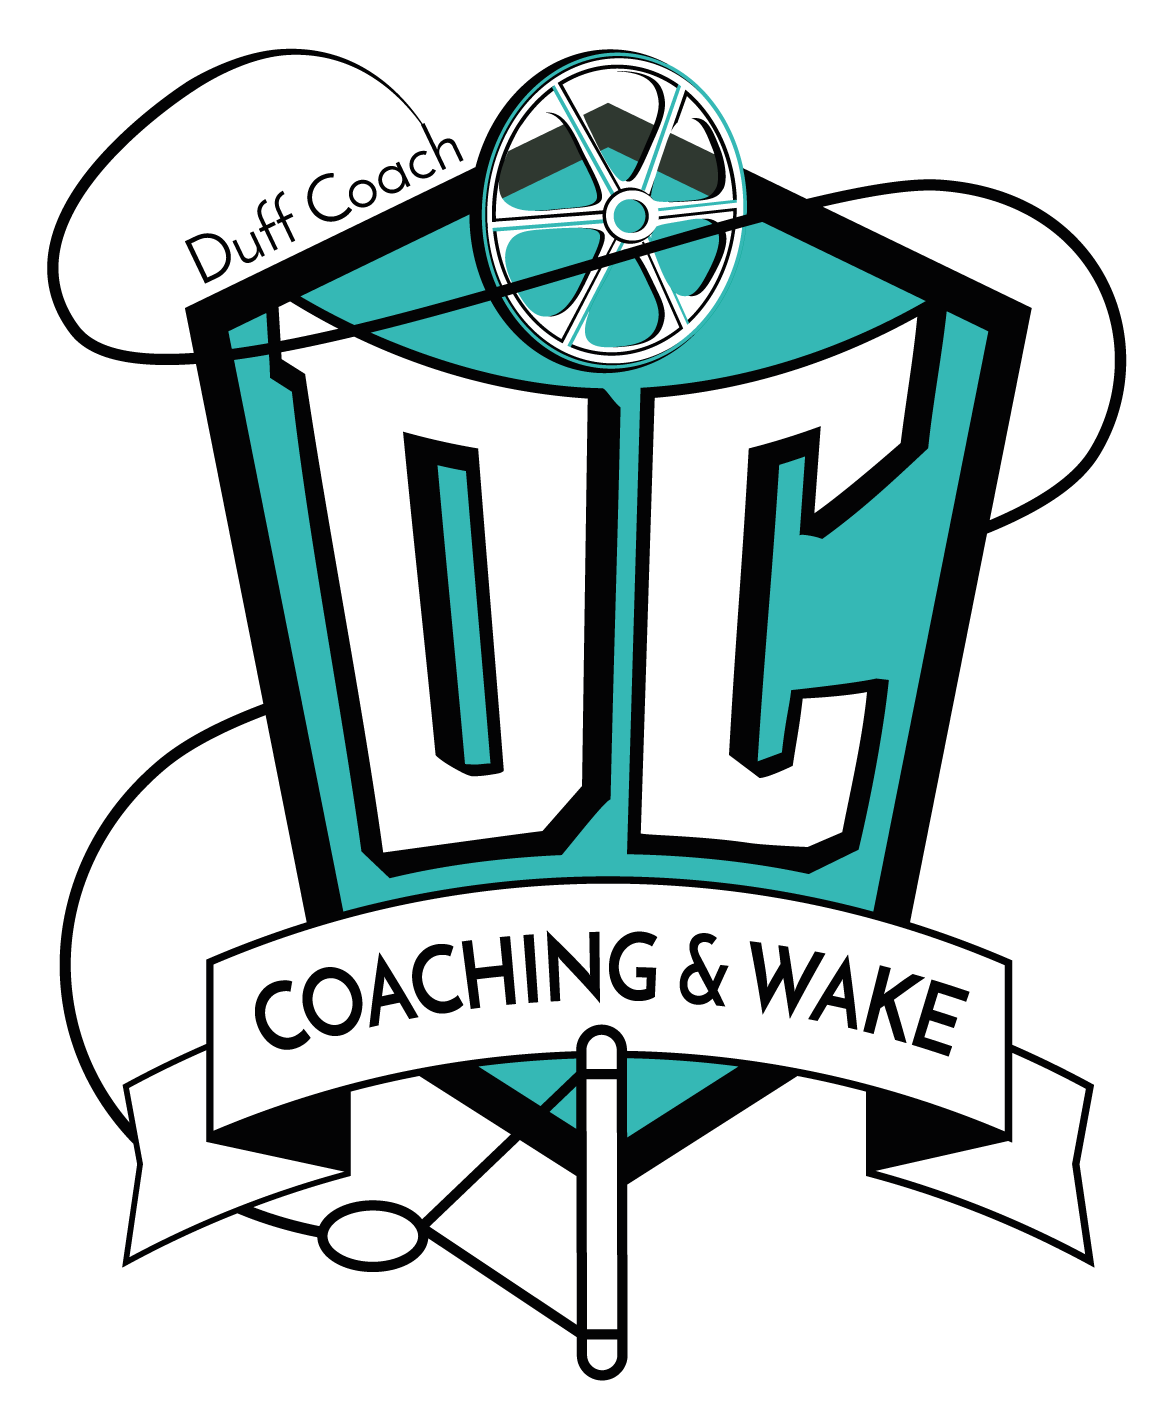 dc wakecoach